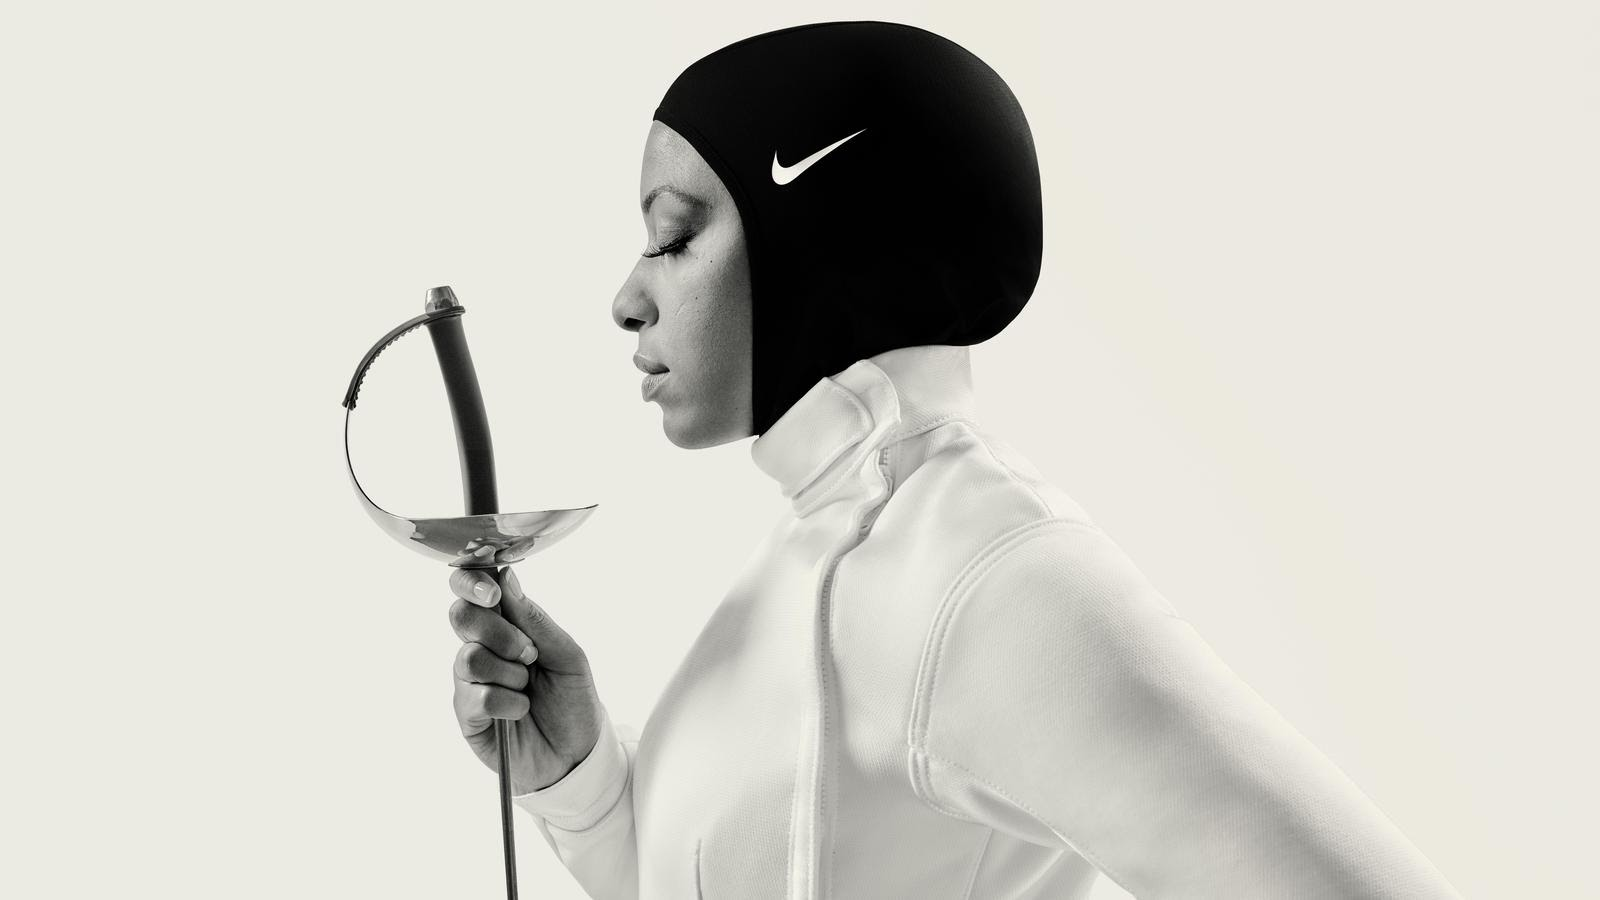 Nike's Pro Hijab